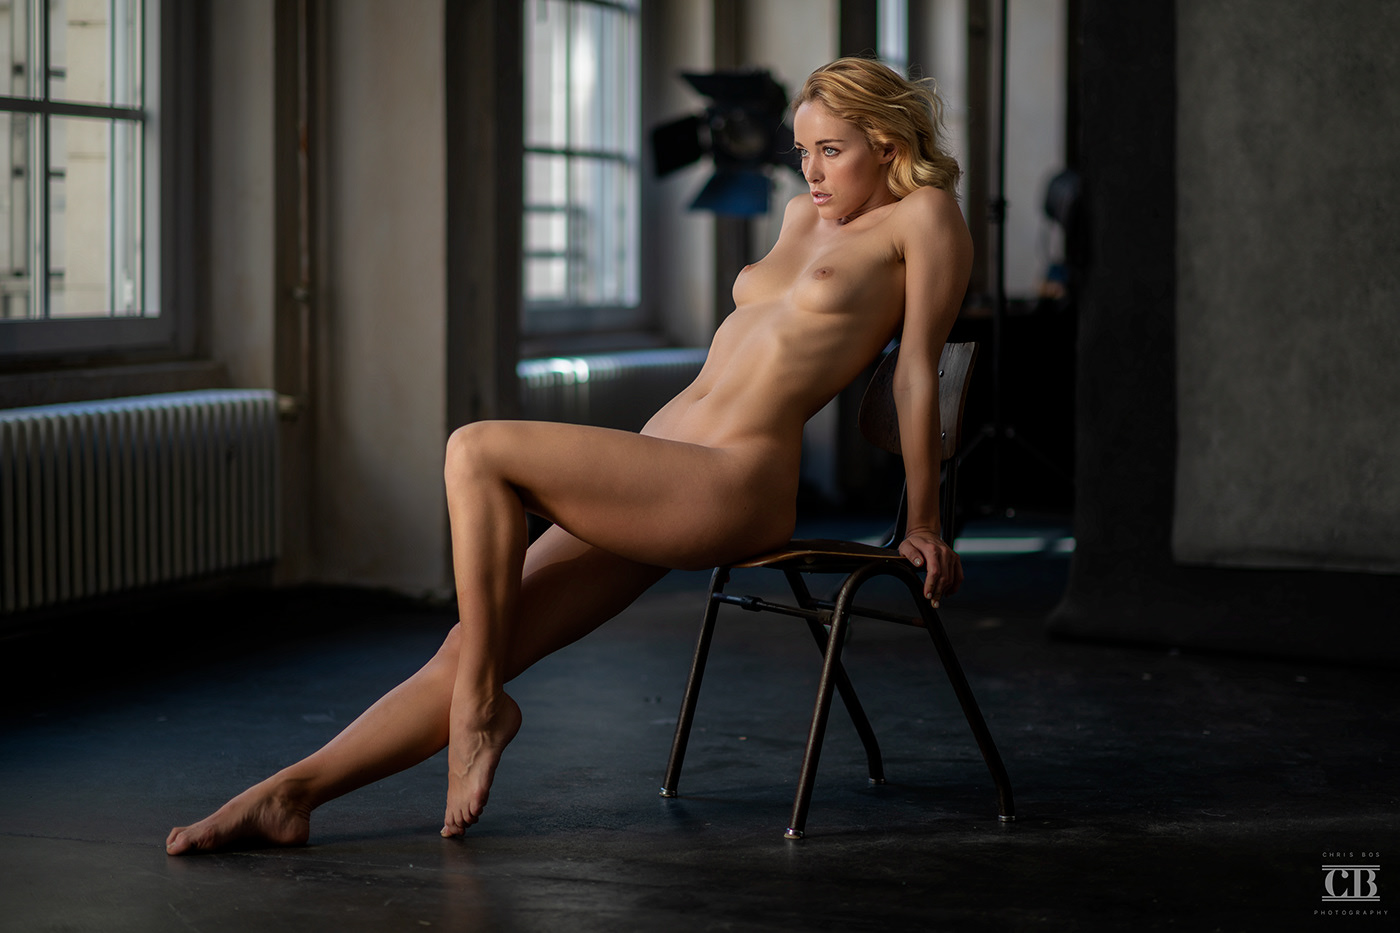 The chair - Viktoria Yarovaya / фотограф Chris Bos